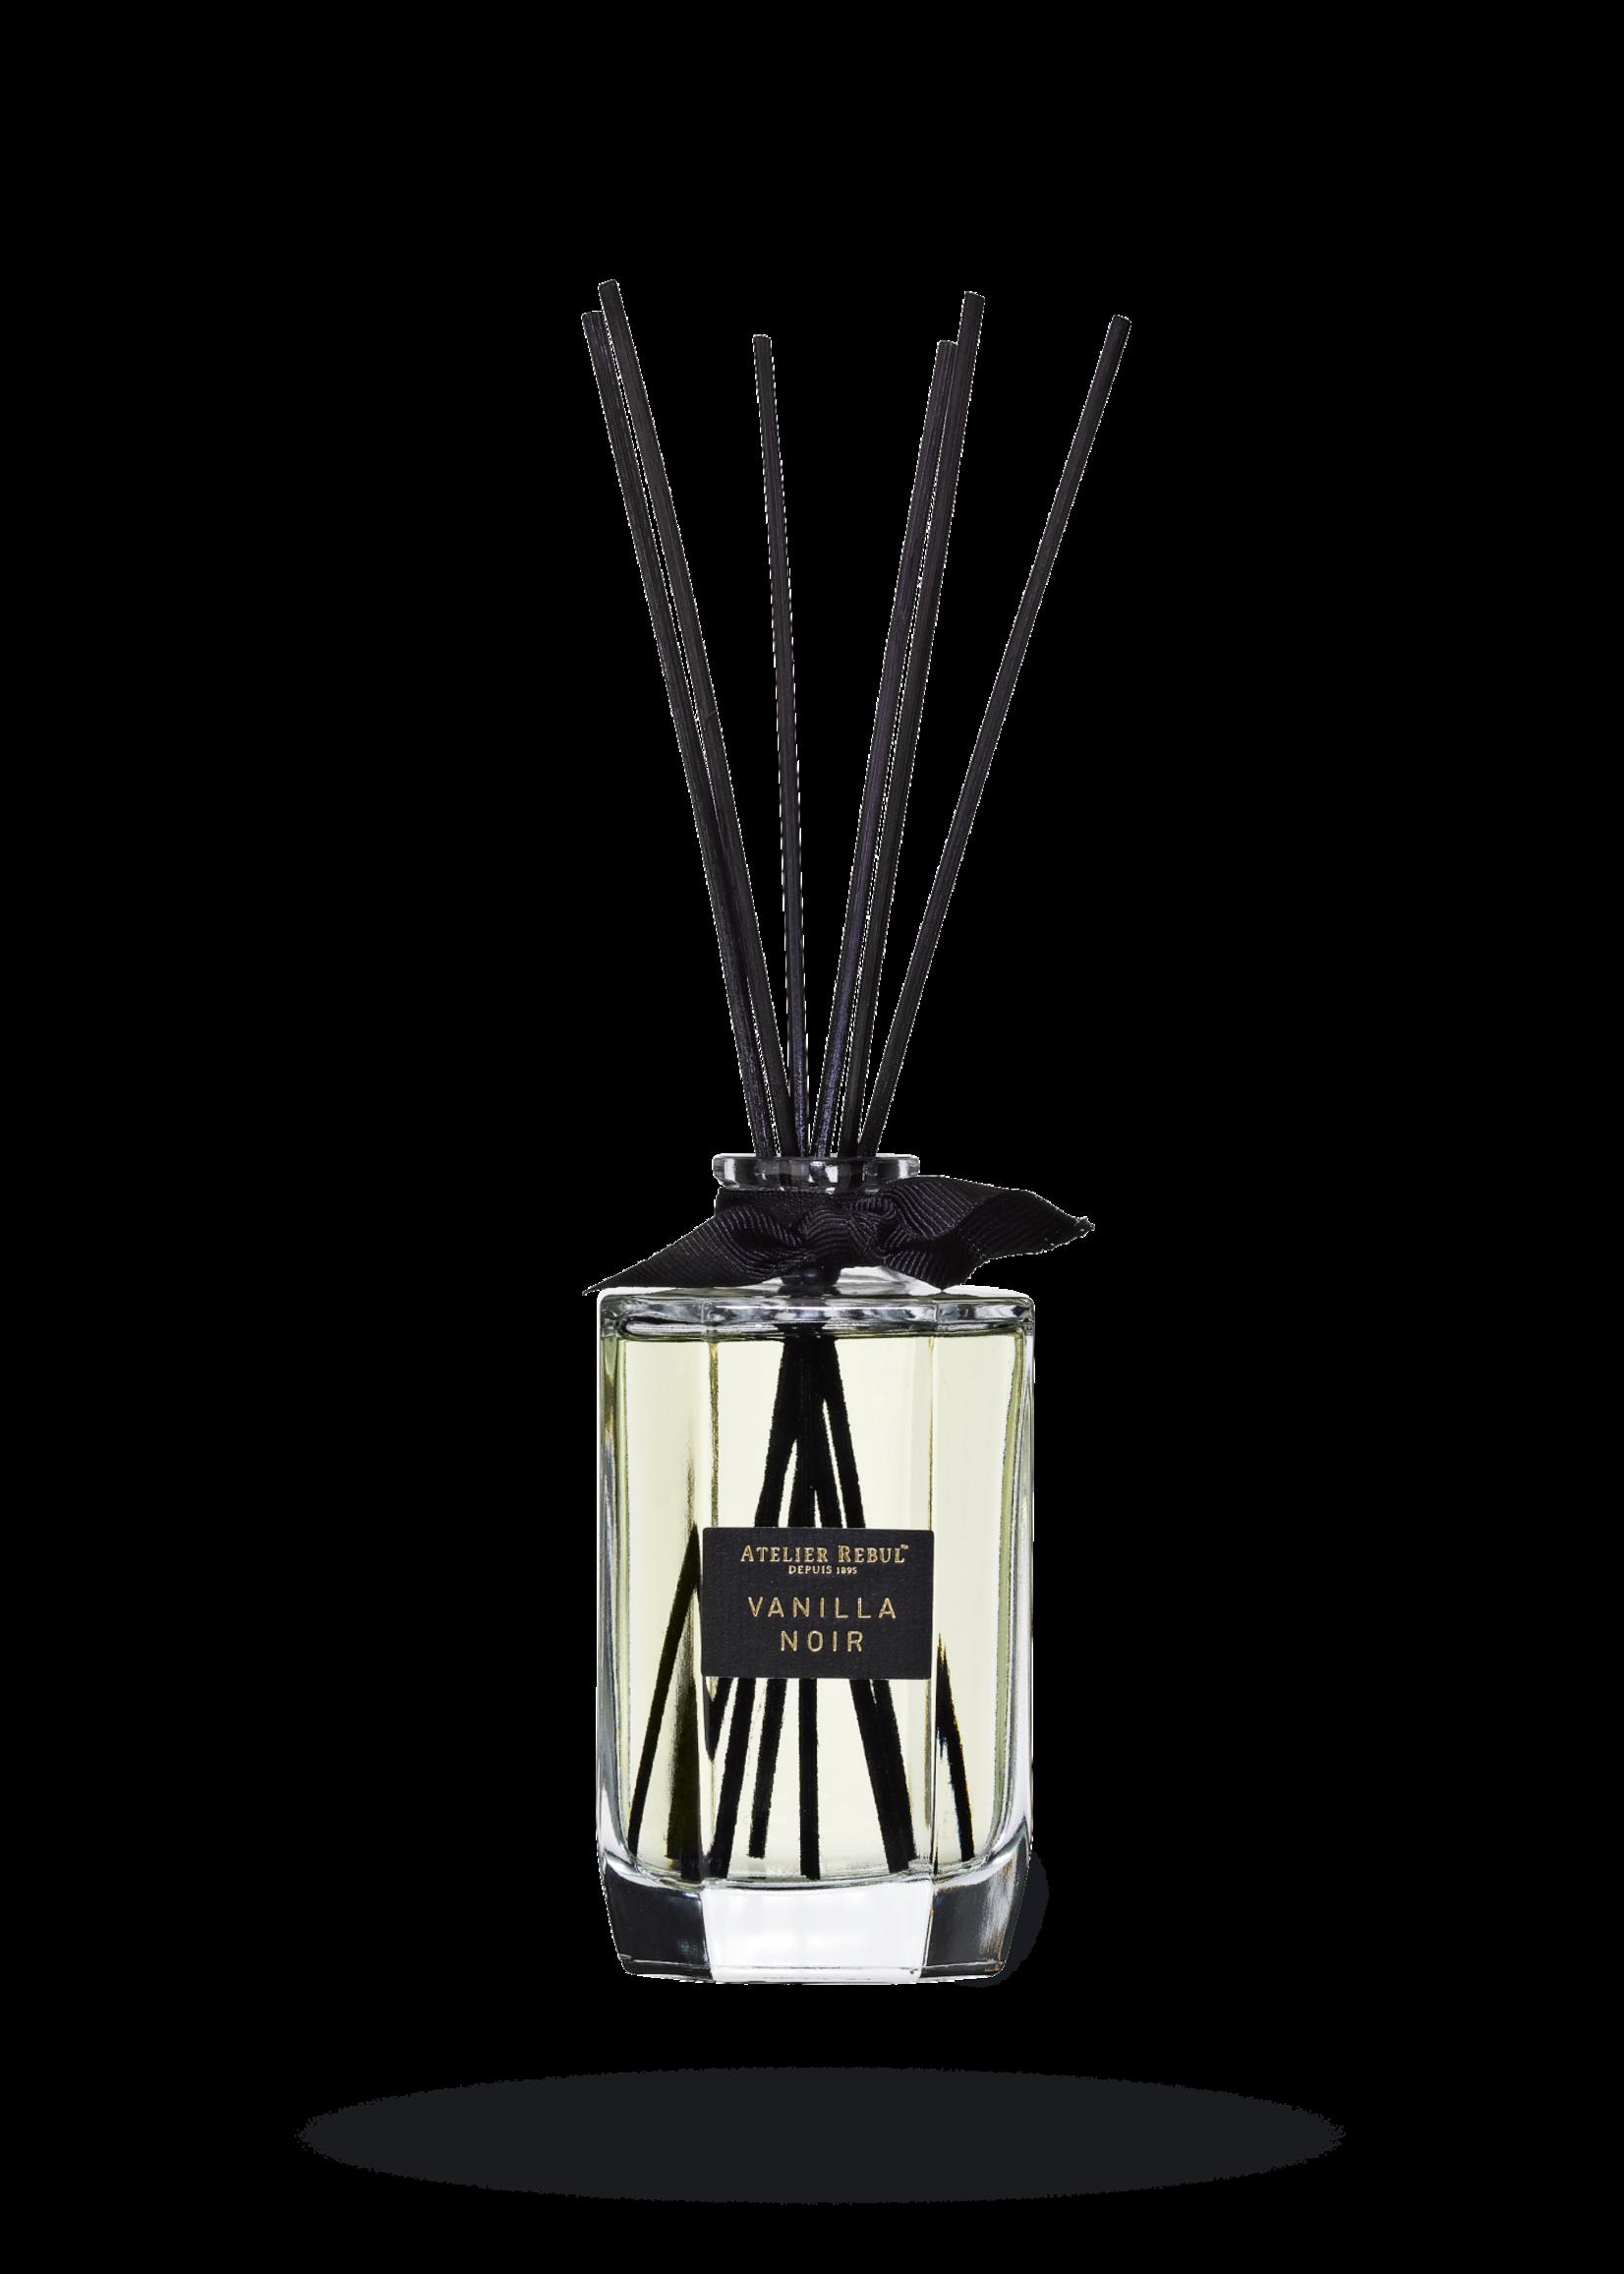 Atelier Rebul Vanilla Noir Reed Diffuser 200ml